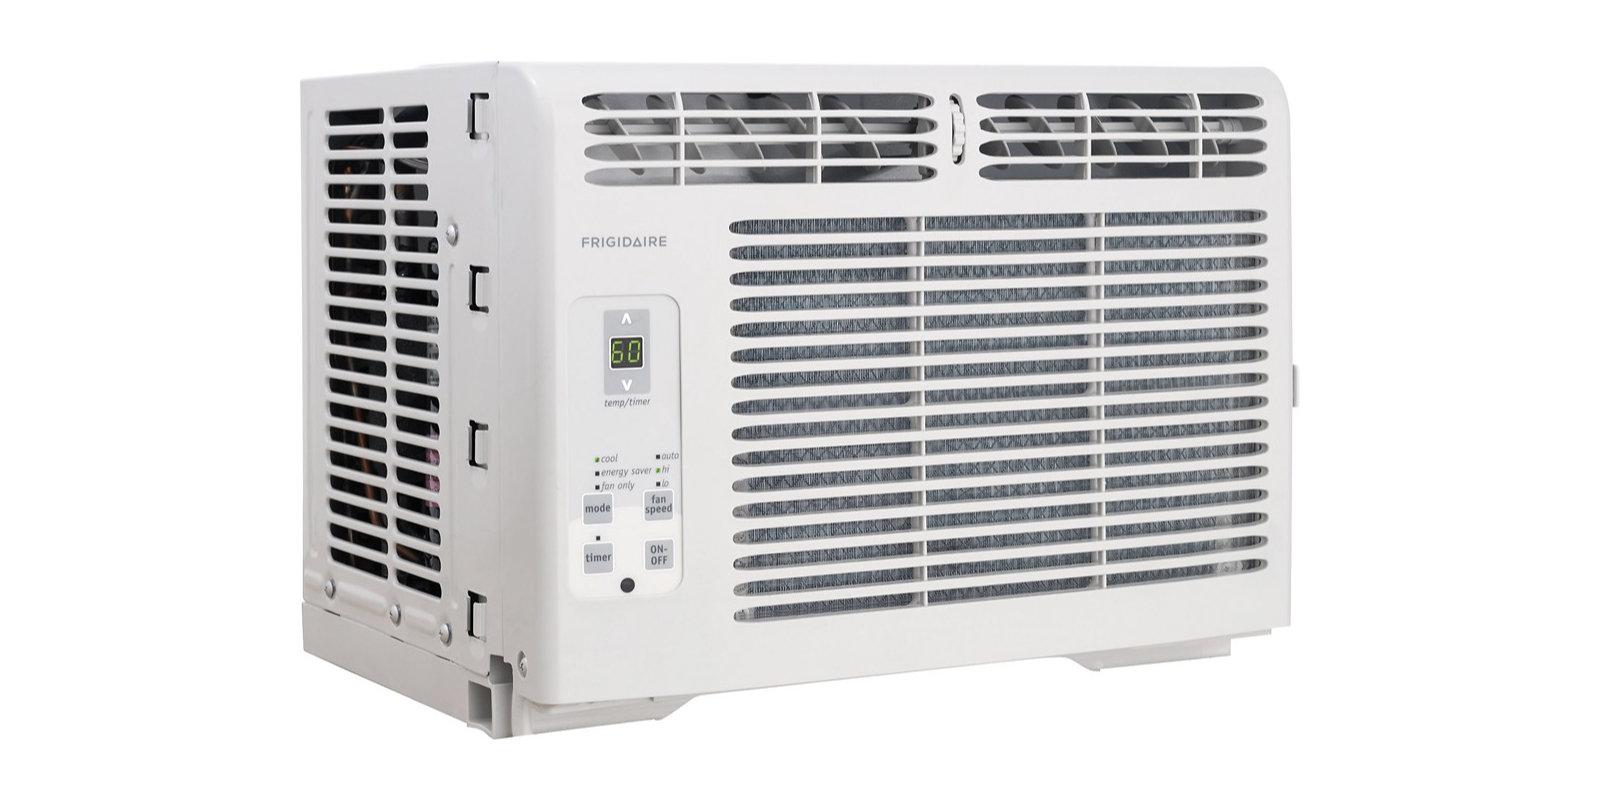 Cool Off Indoors W A Frigidaire 5000btu Window Air